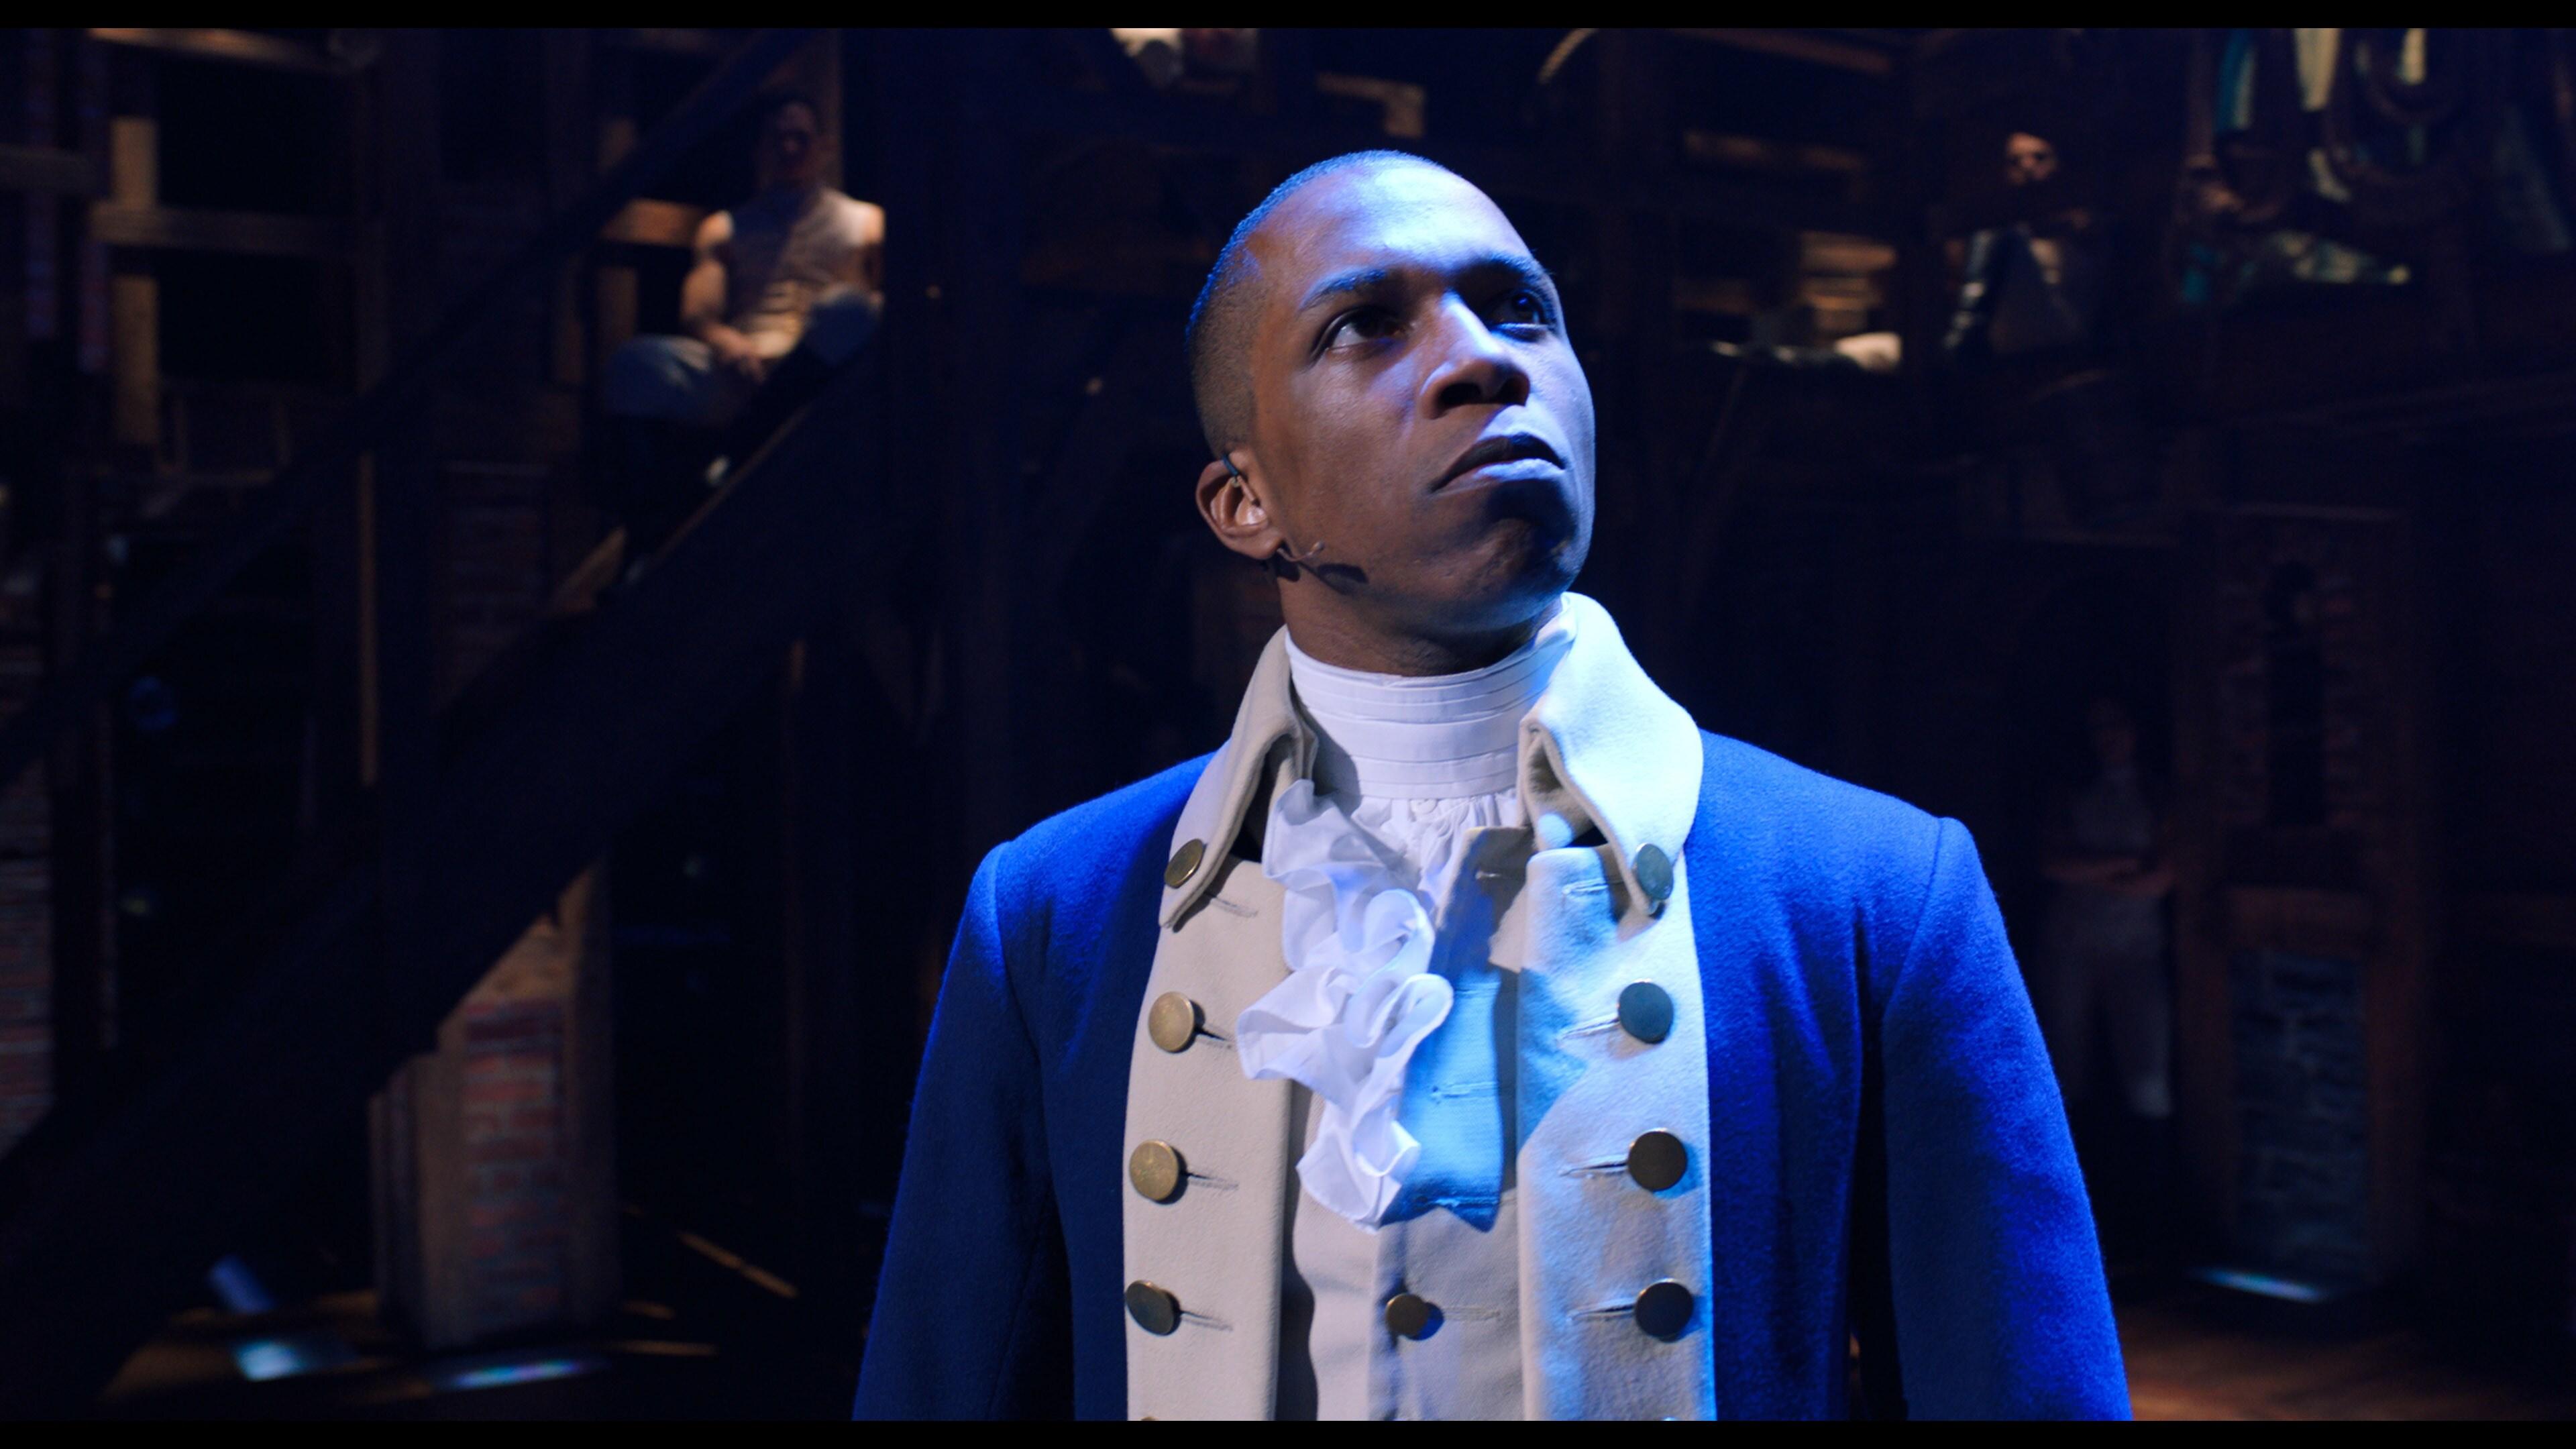 Aaron Burr from Hamilton